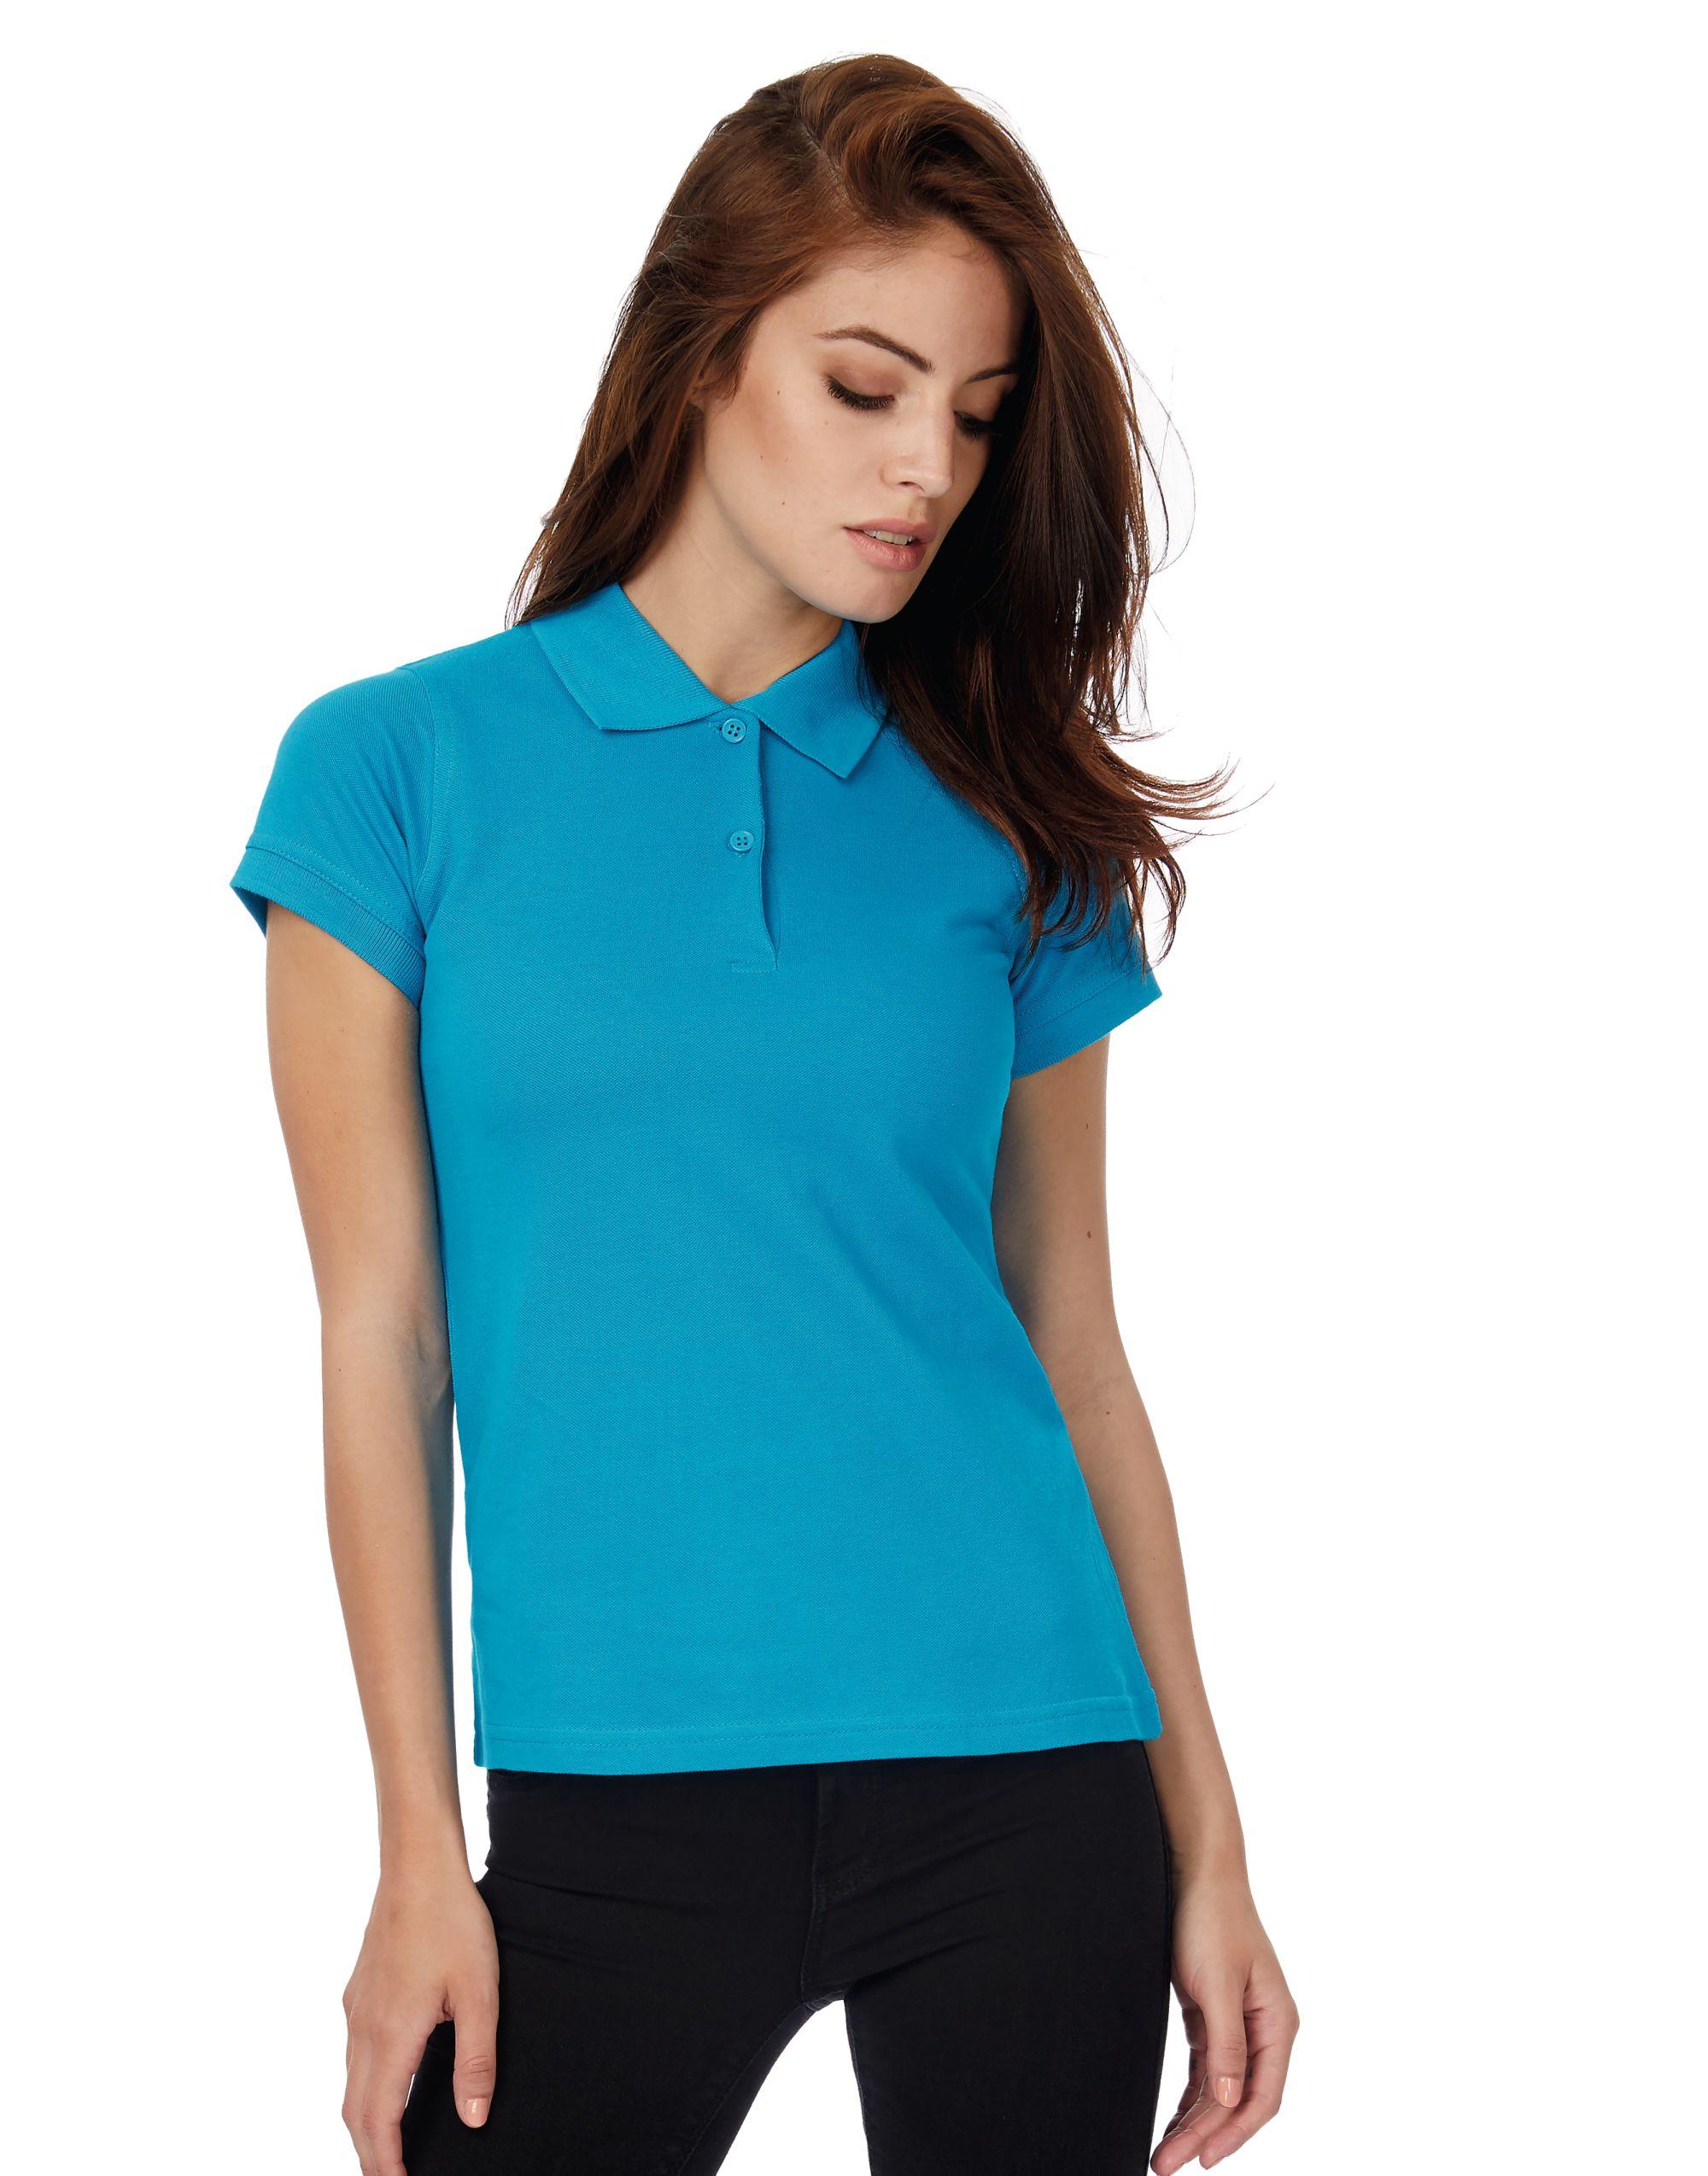 B&C Women's Safran Pure Polo Shirt